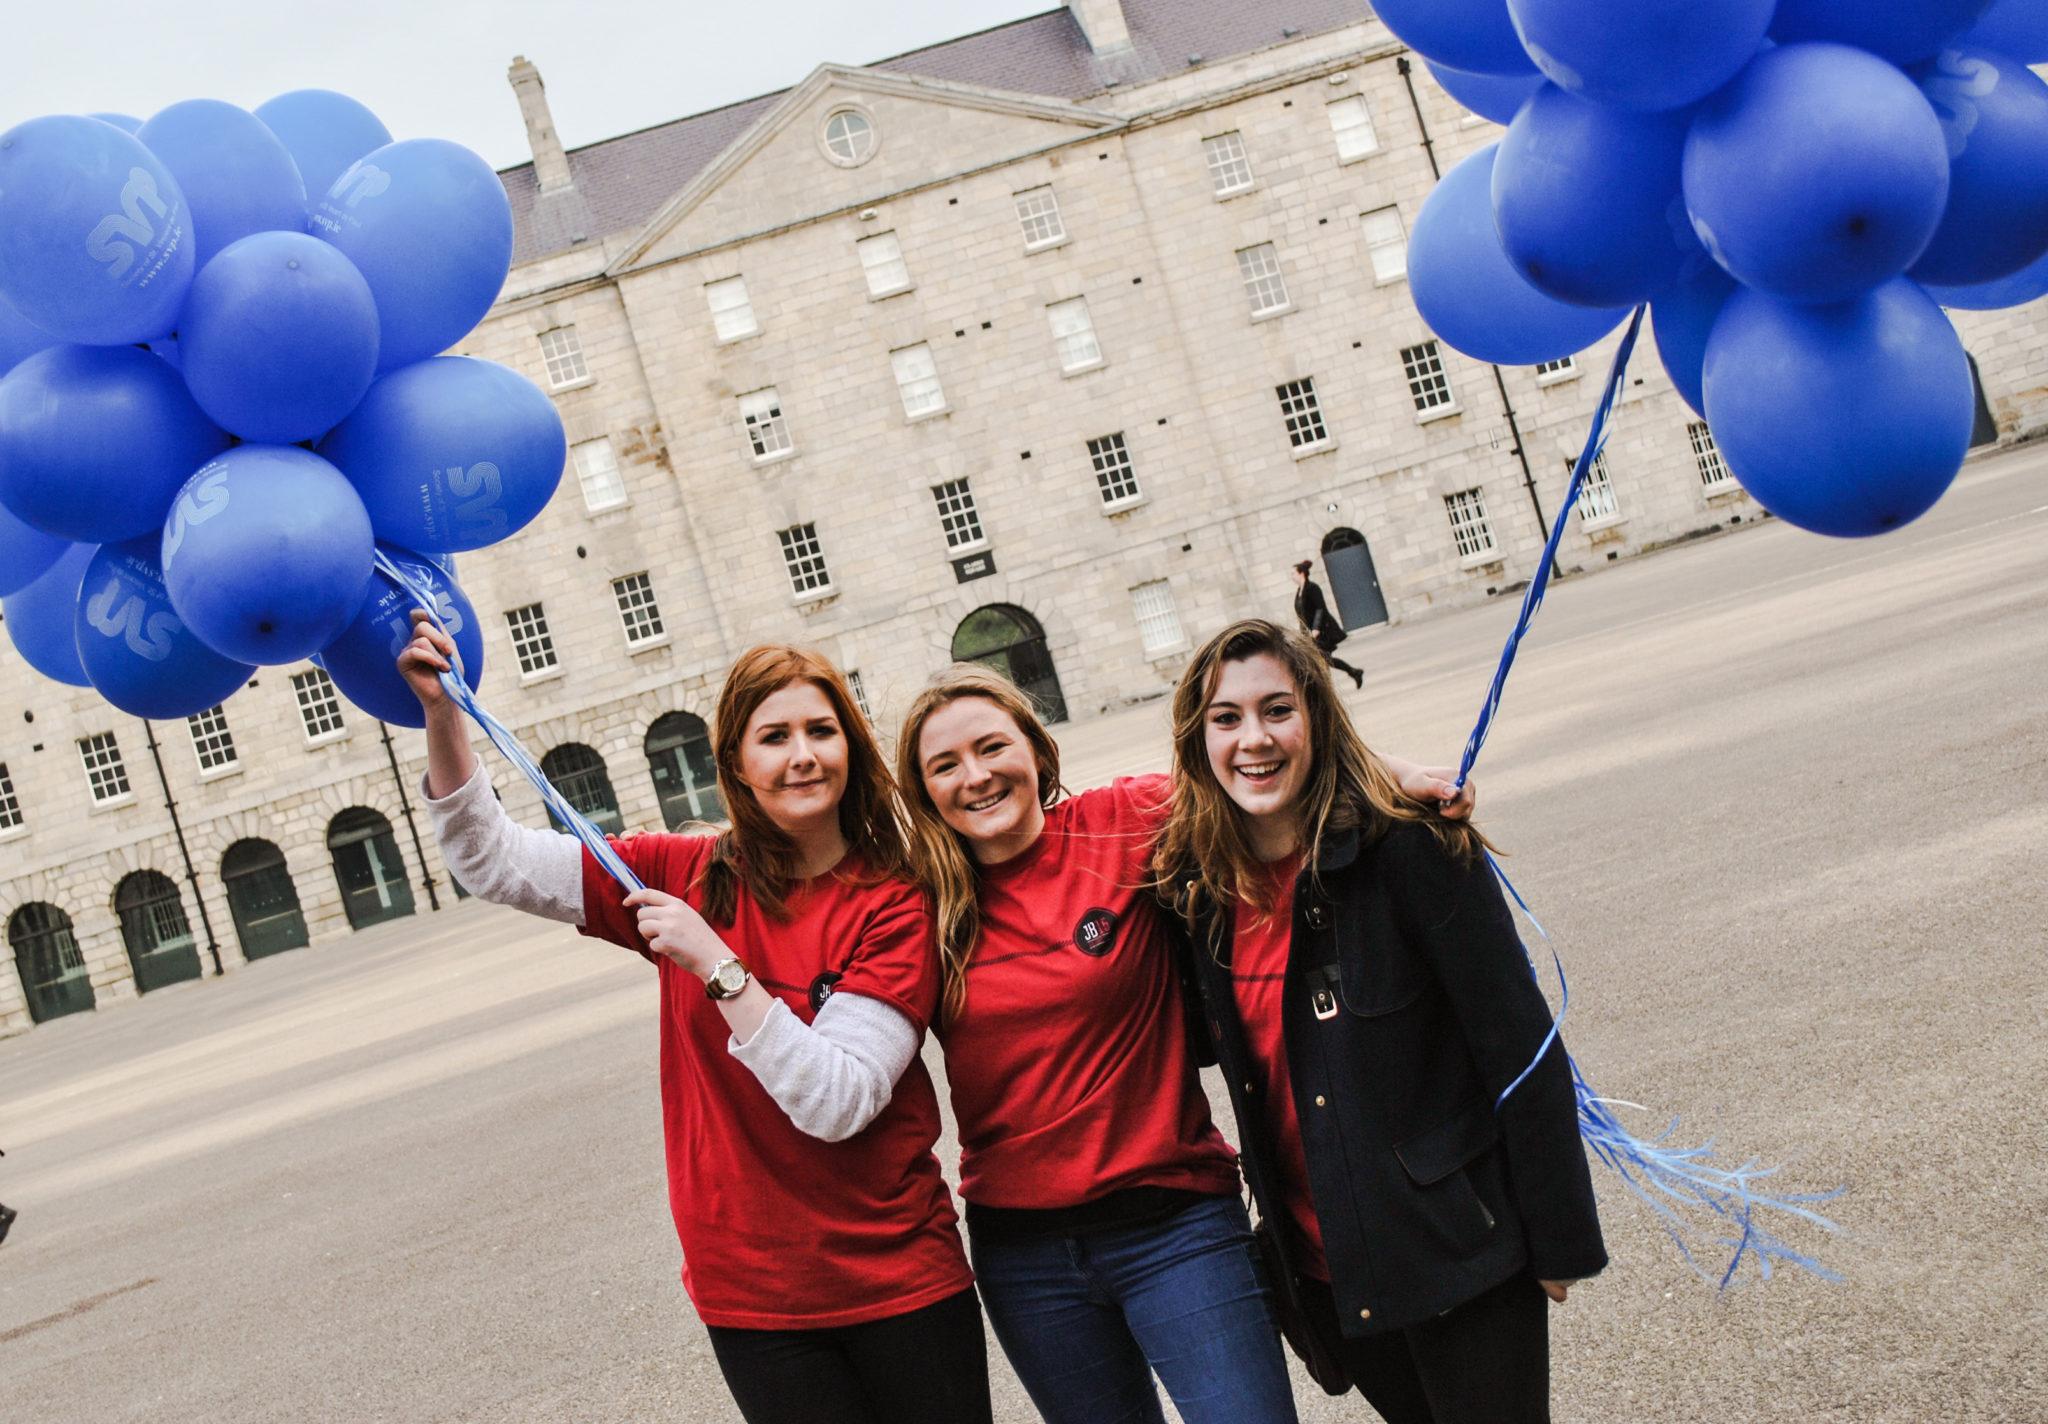 Jailbreak adventure race won by Trinity College Dublin students